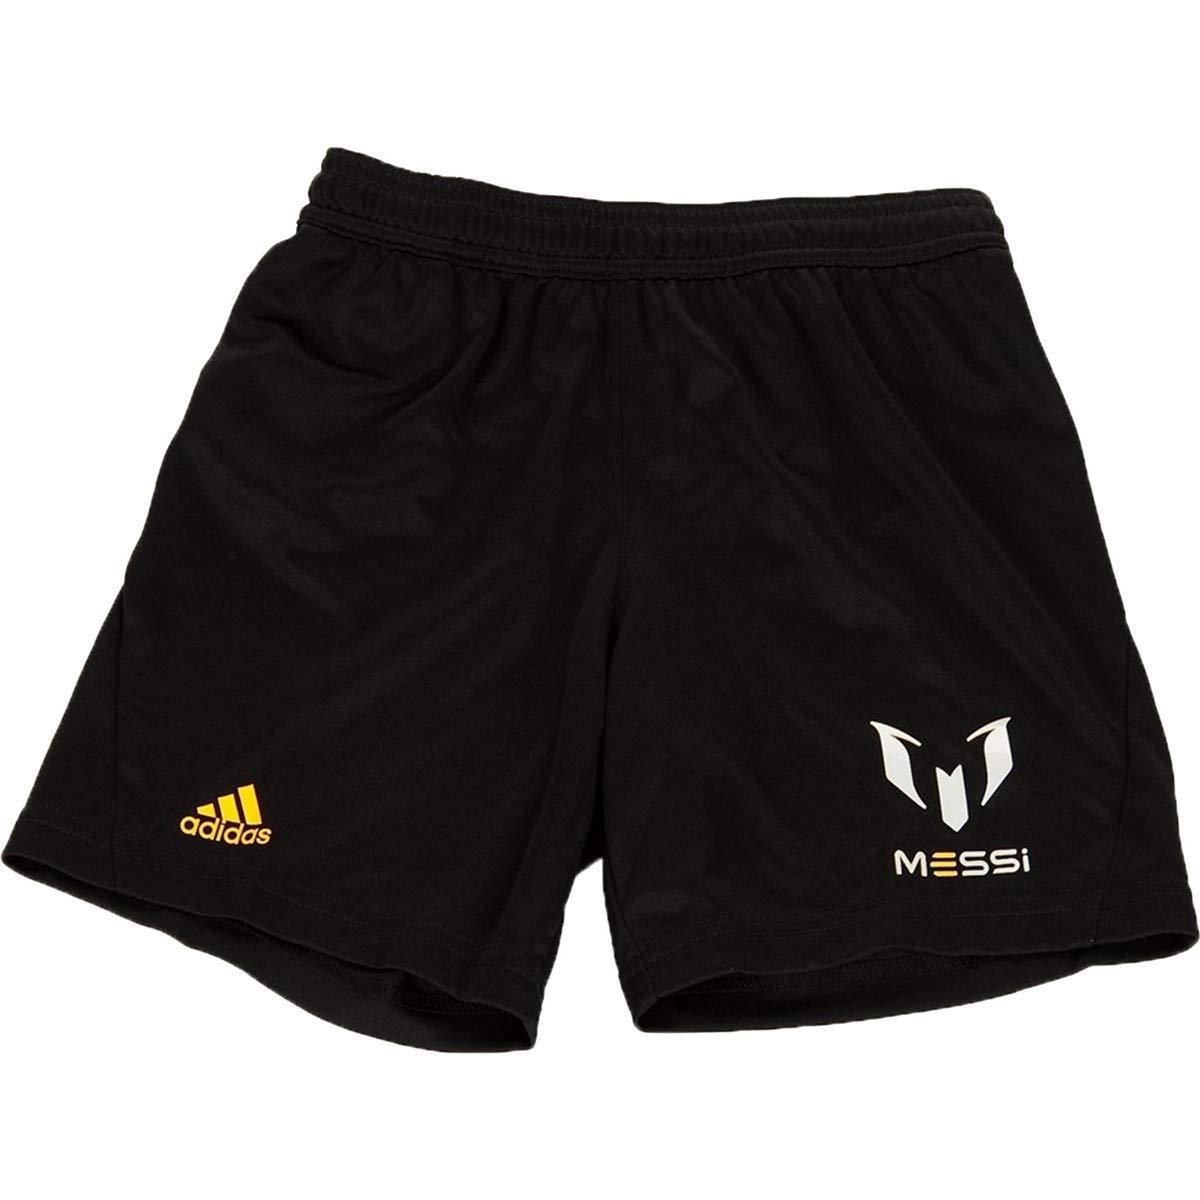 Pantalón Corto adidas F50 Messi Negro